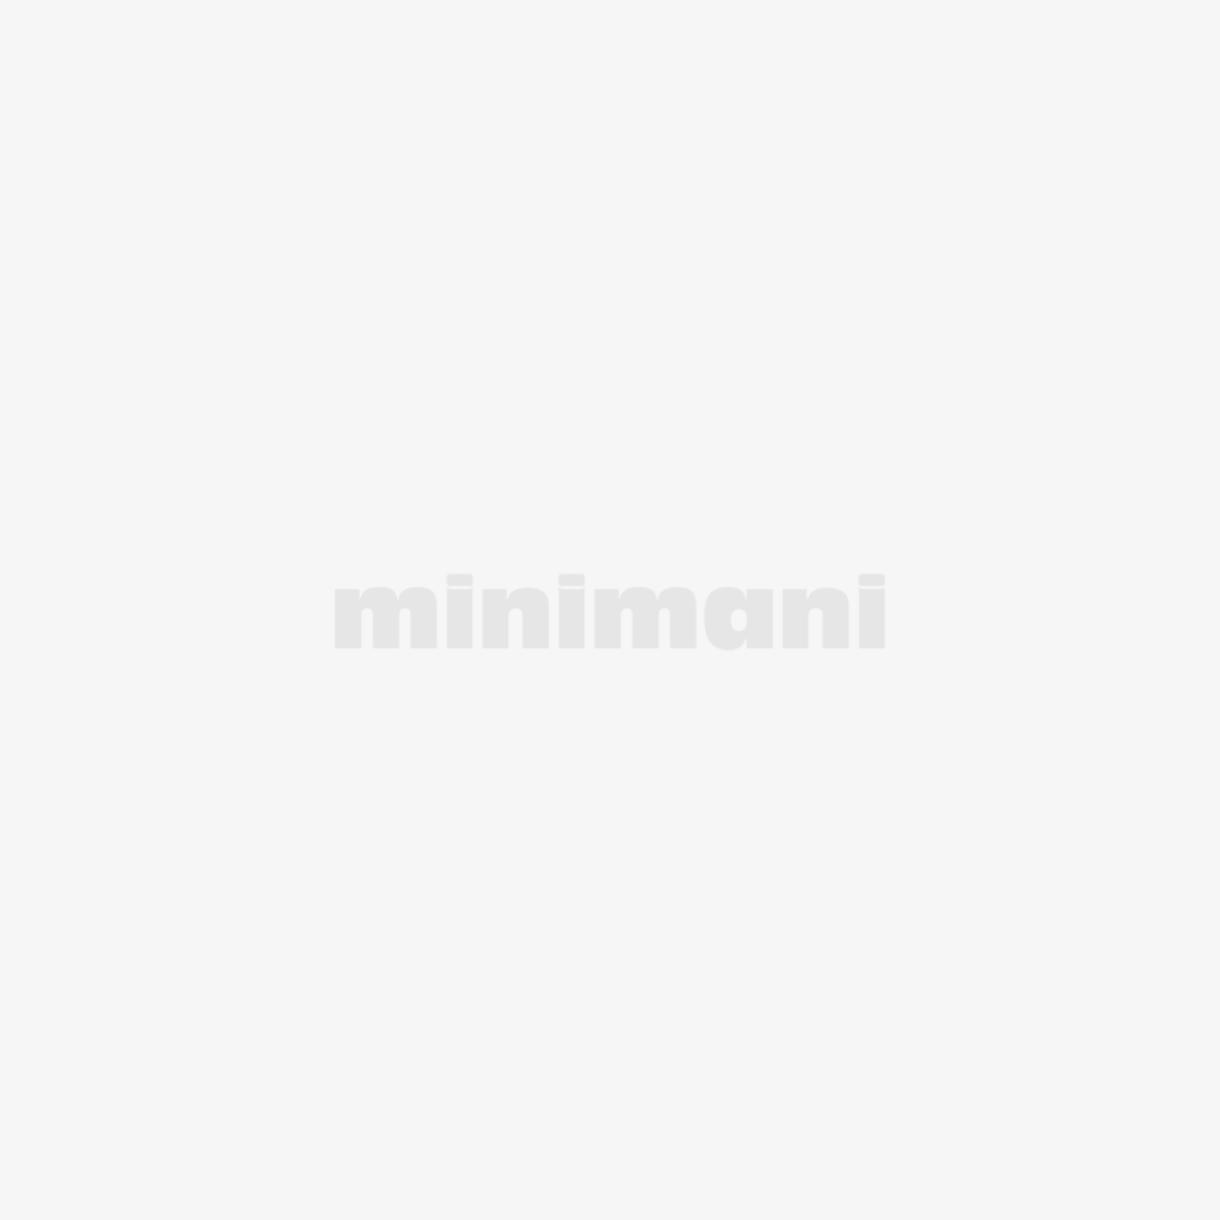 AUTOGLYM CABRIOLET FABRIC HOOD MAINTENANCE KIT 2*500ML